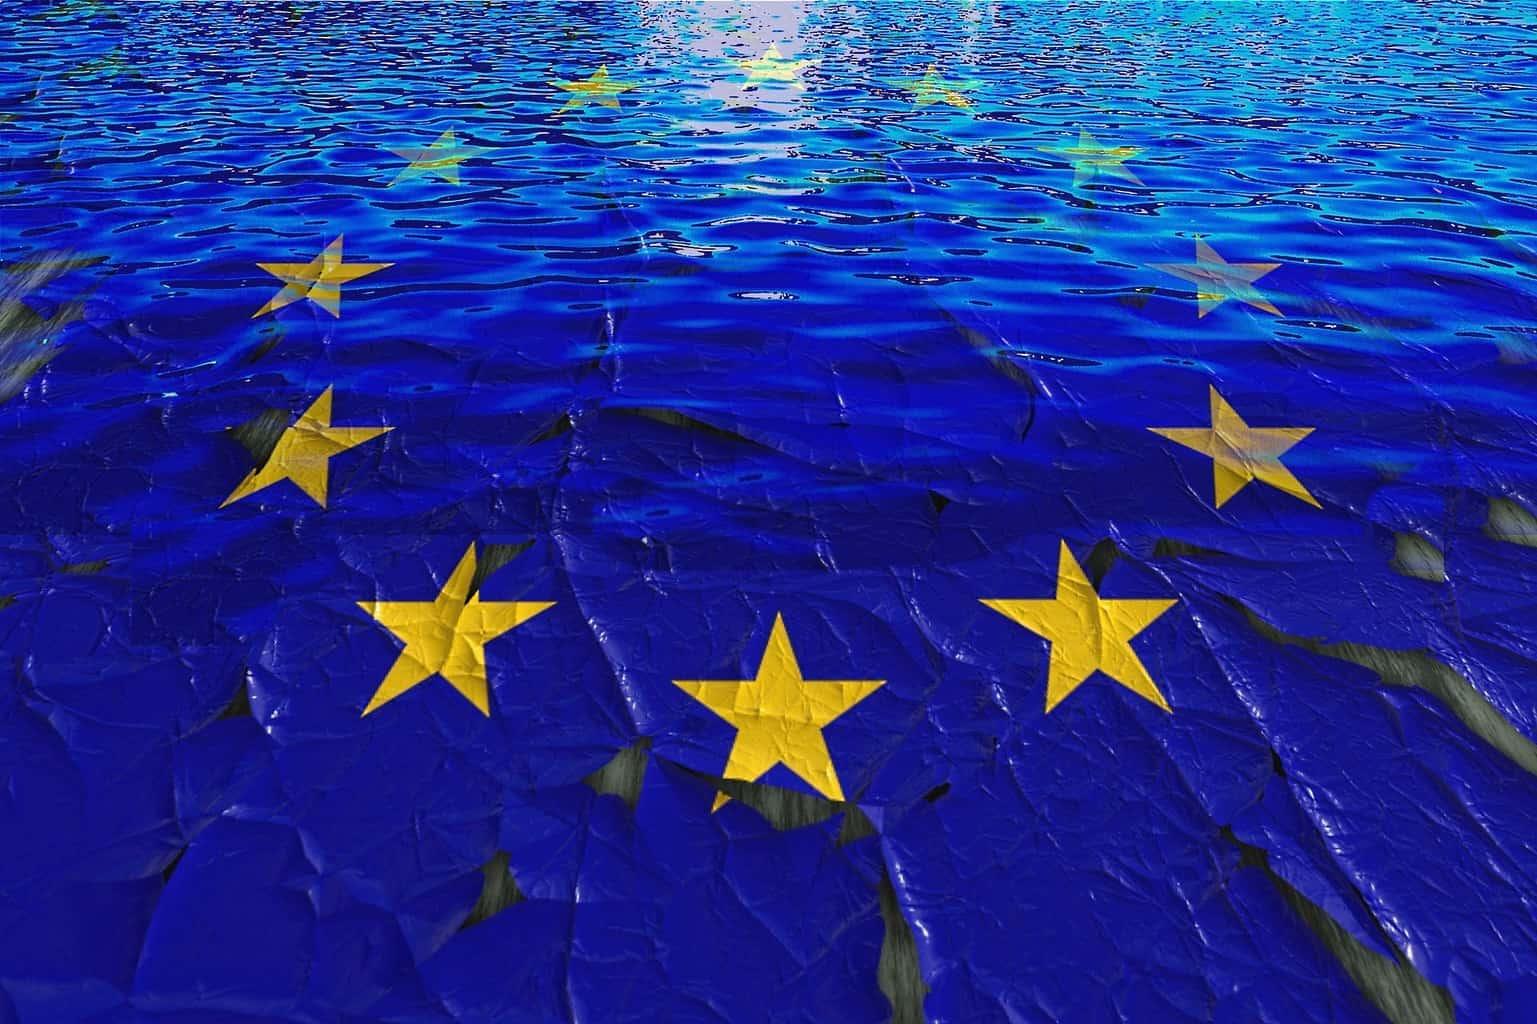 An image of a tattered EU flag